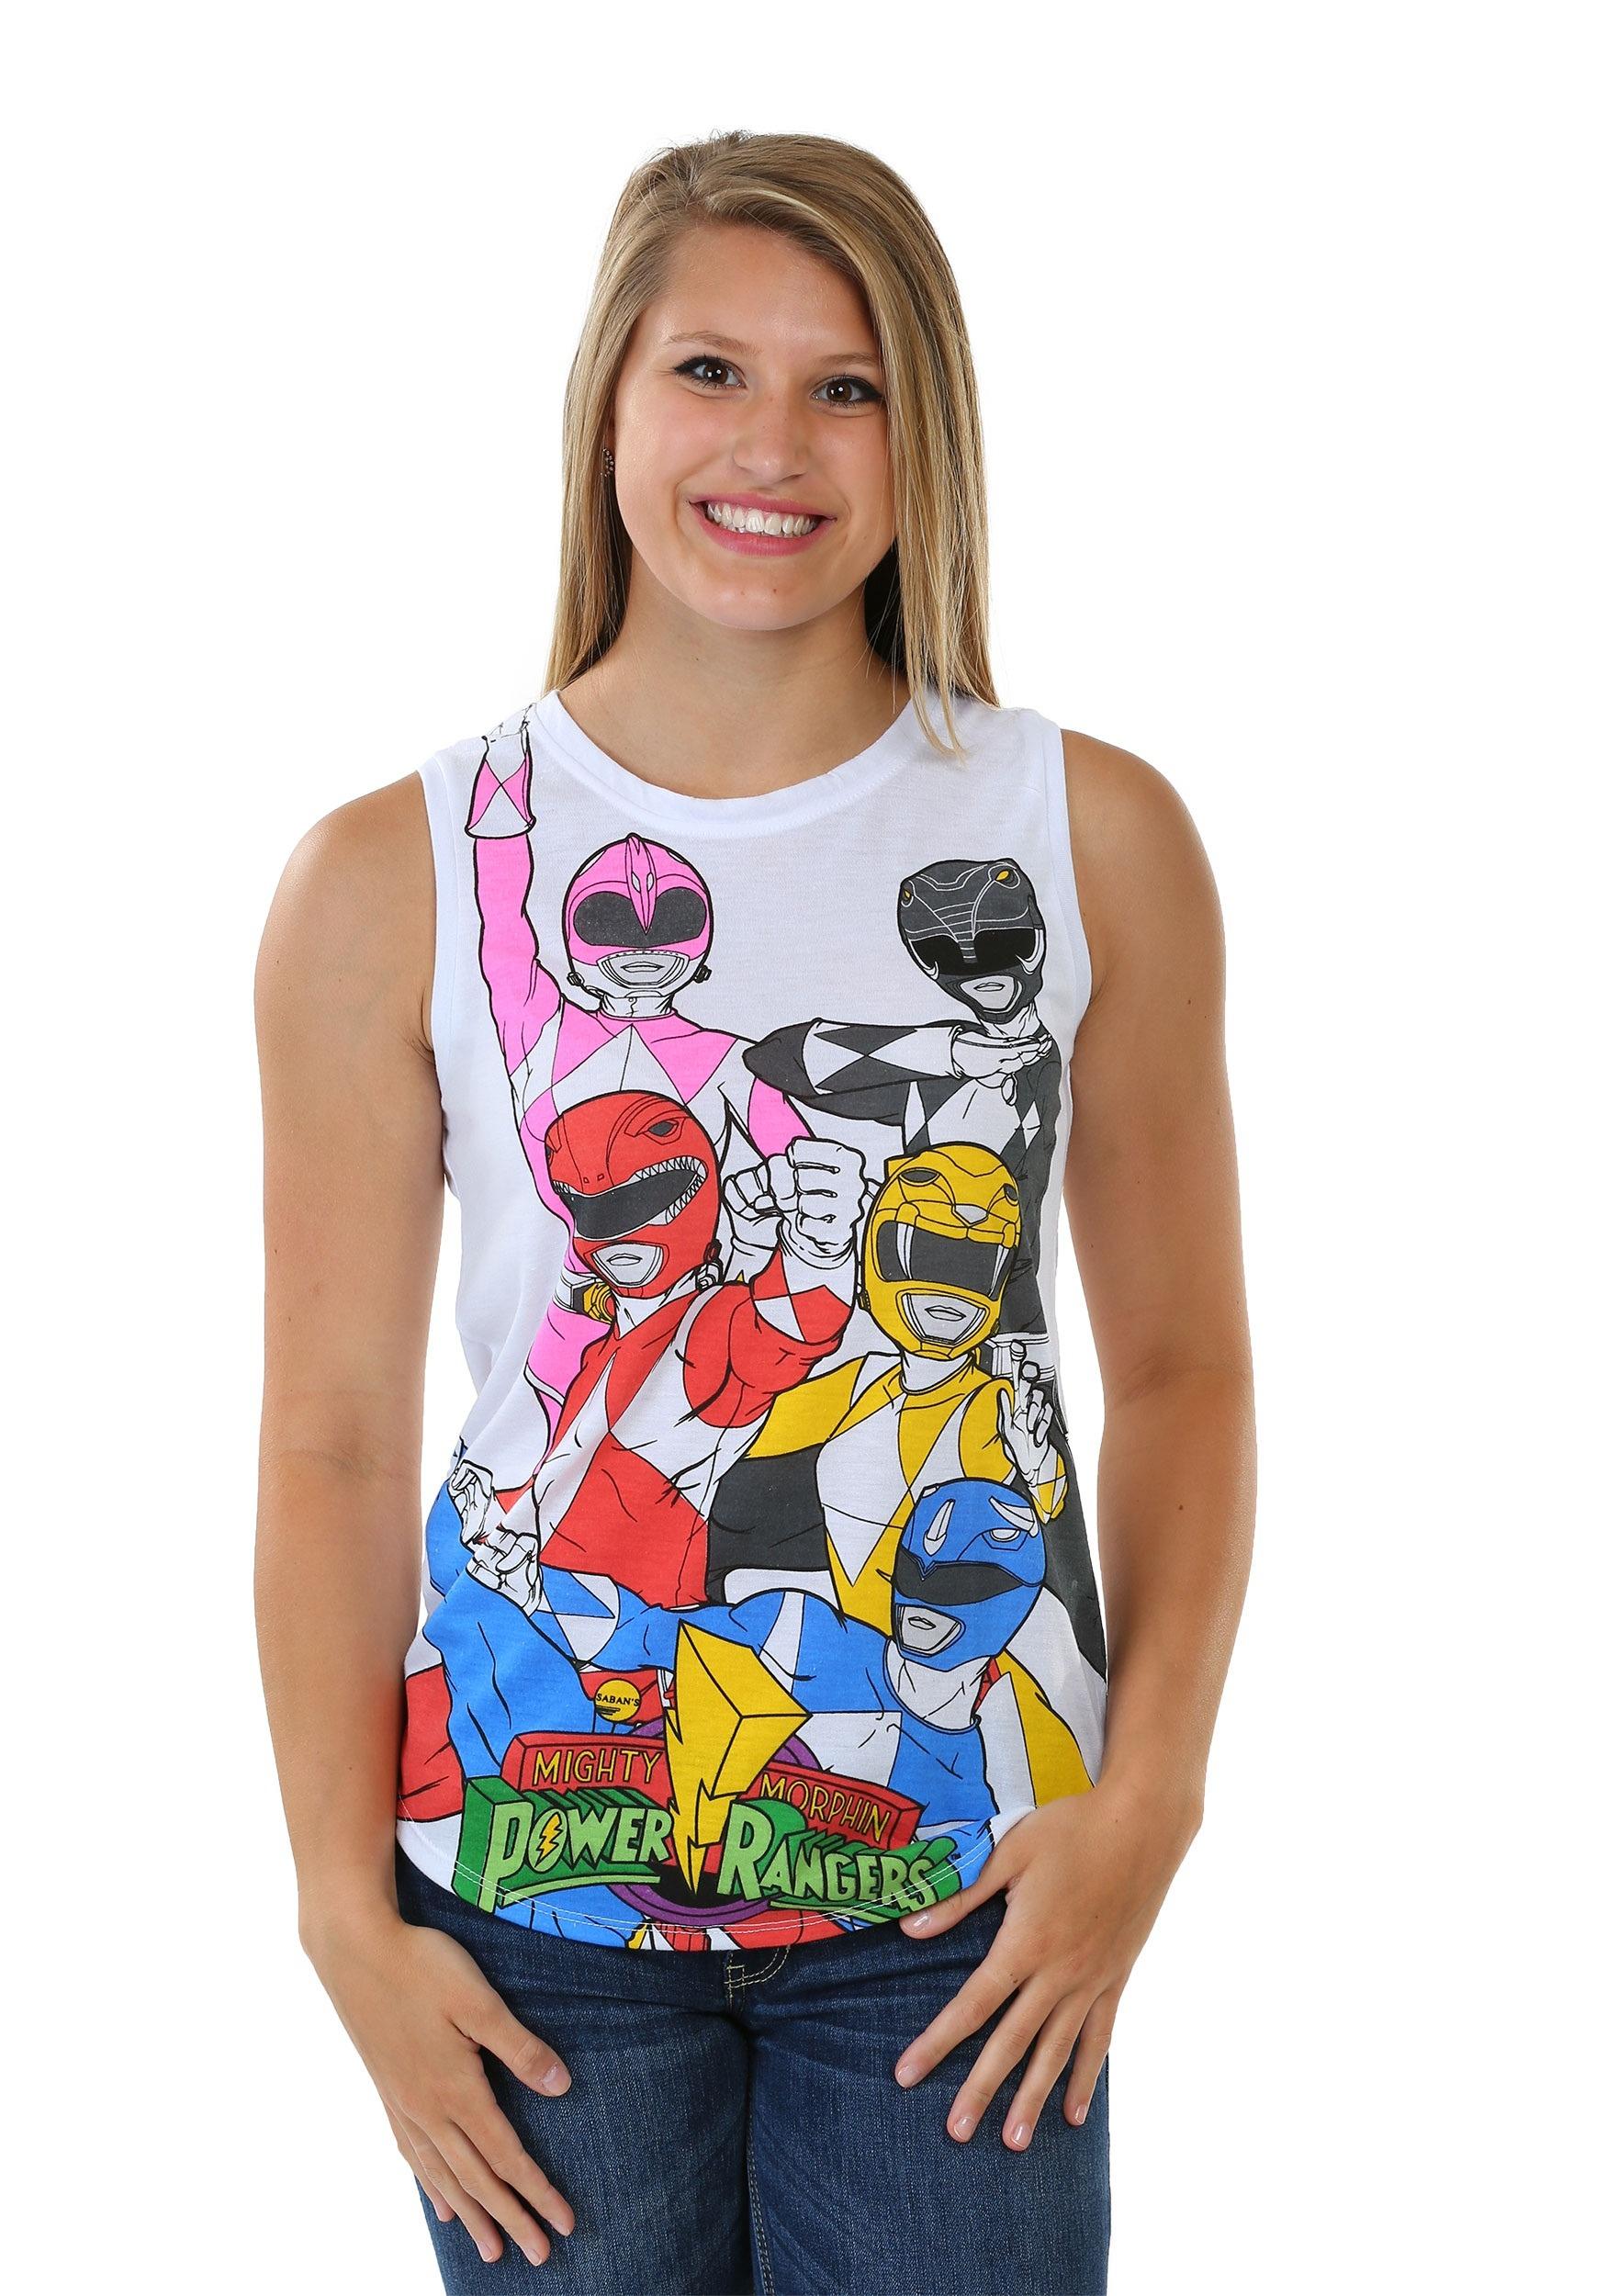 Power Rangers Panel Print Women's Muscle Tank